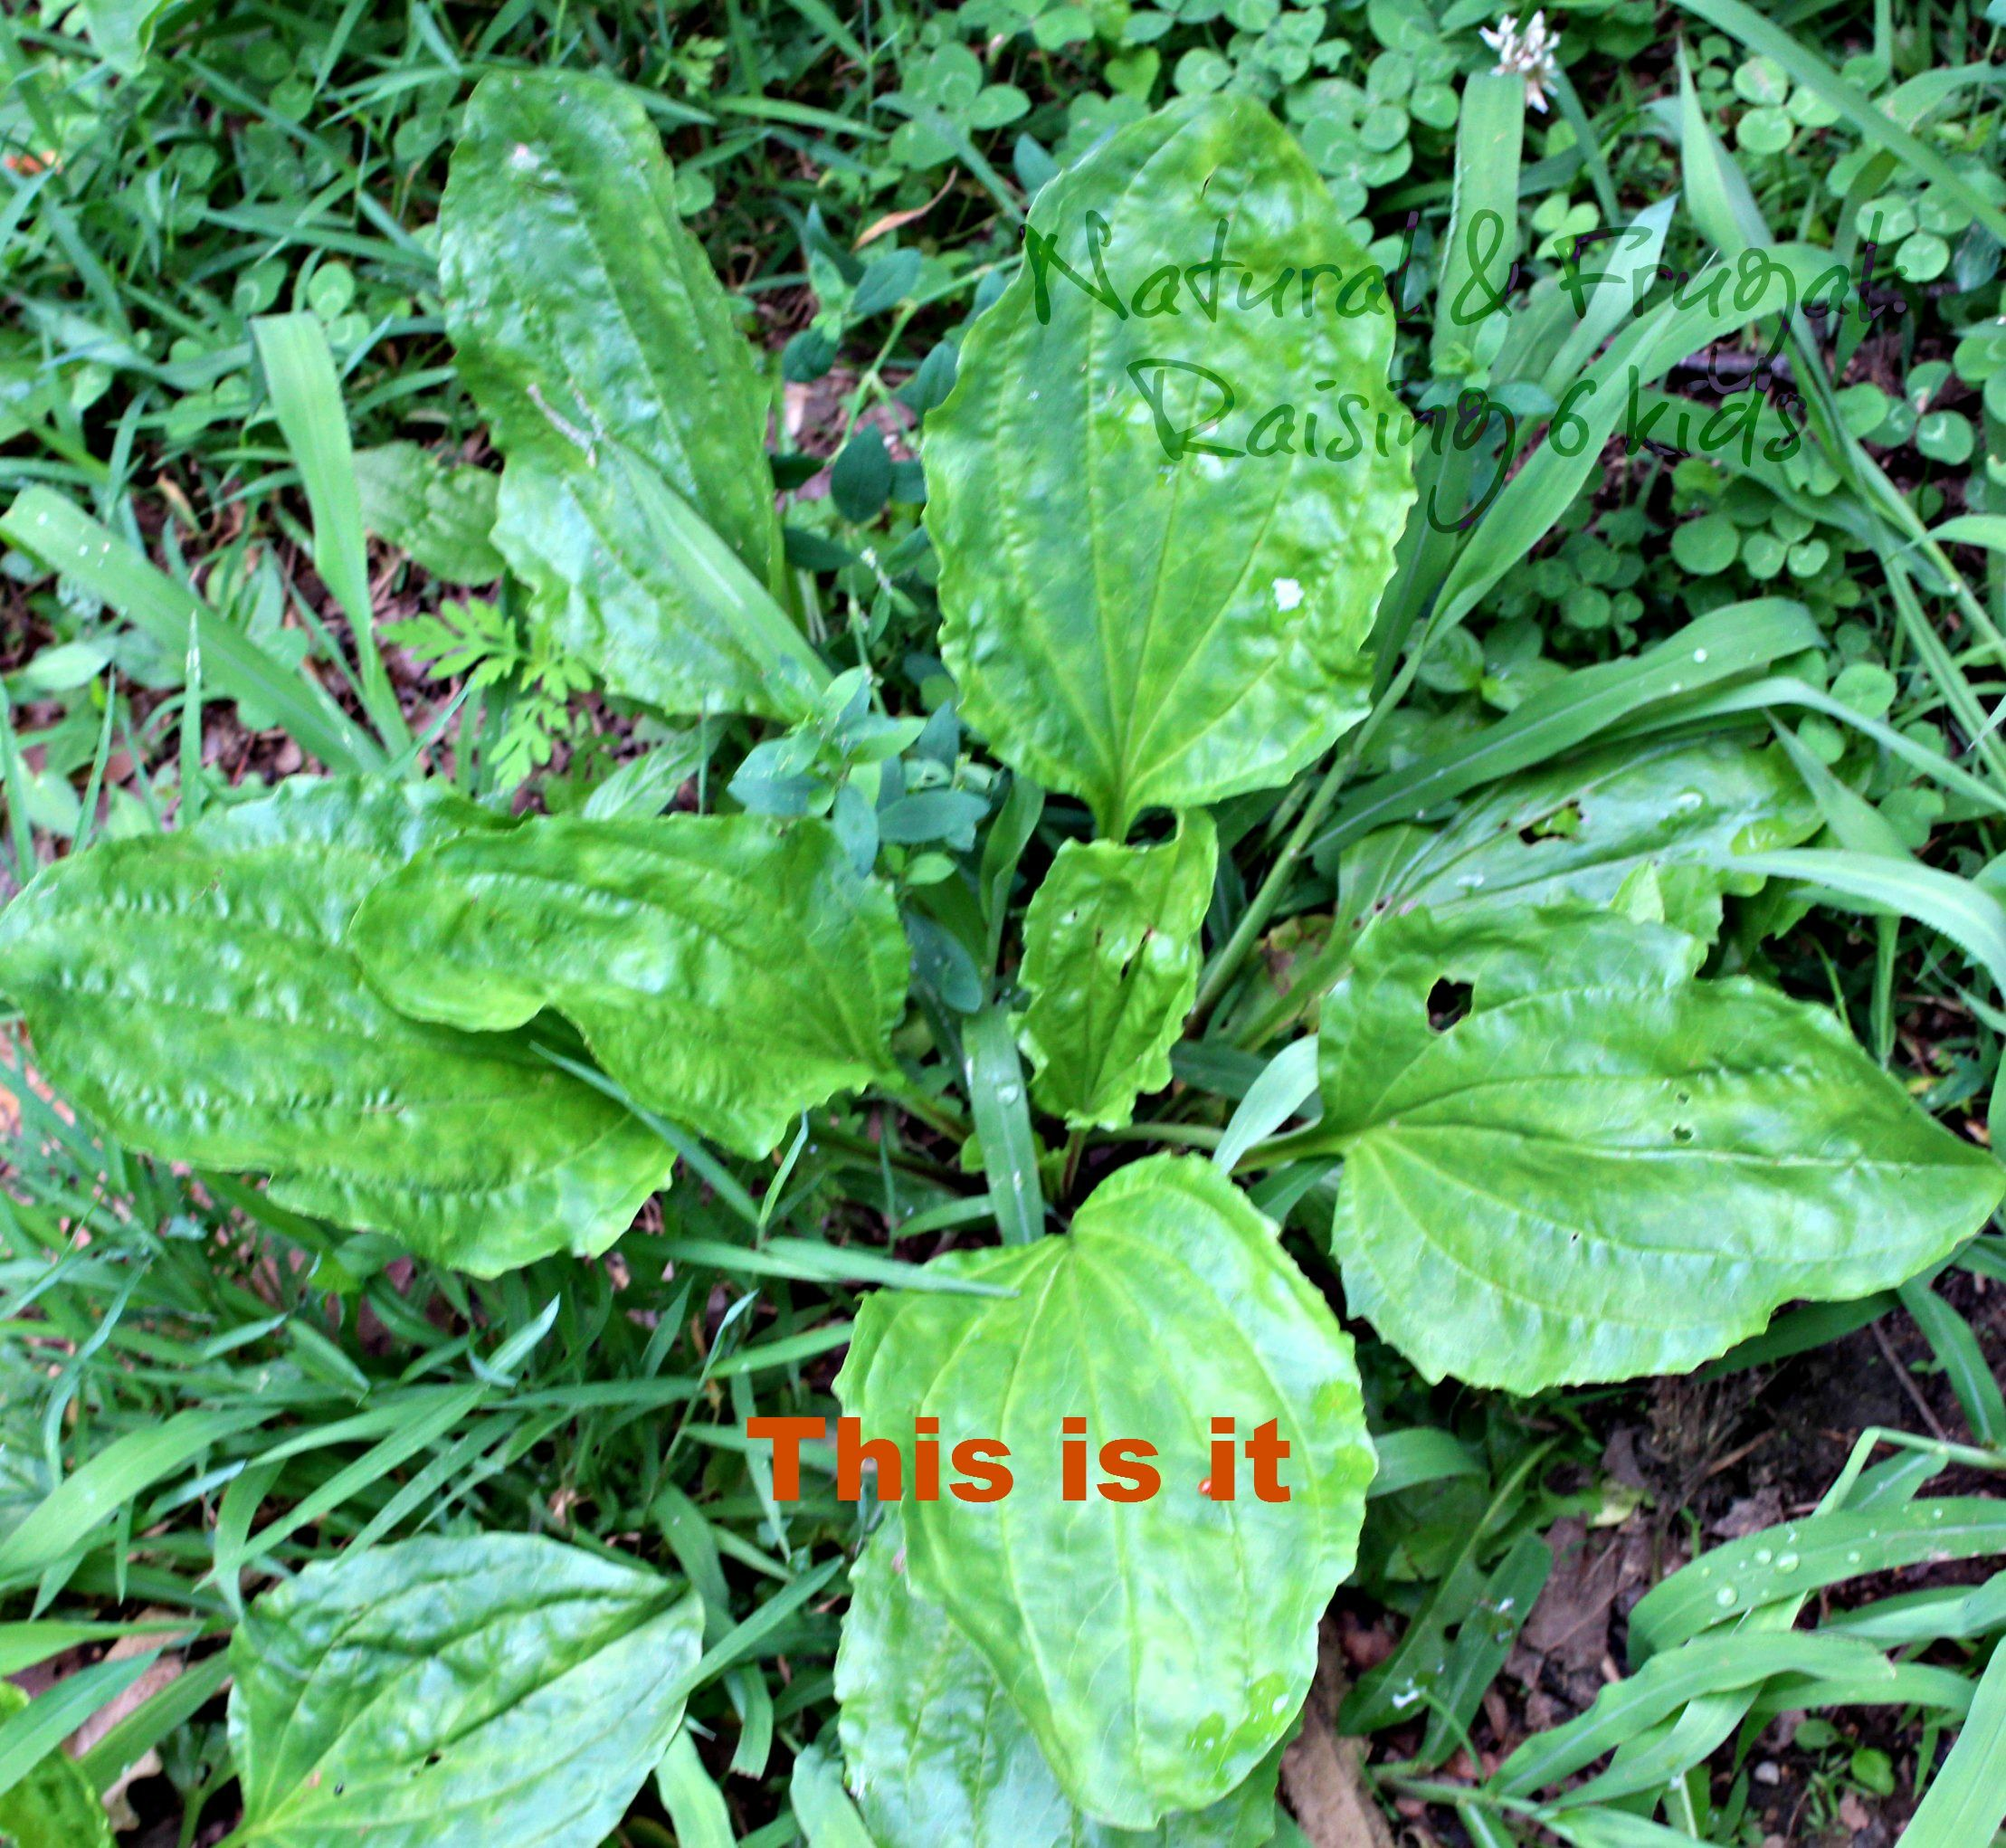 A DIY Life: Part 1- Picking Plantain